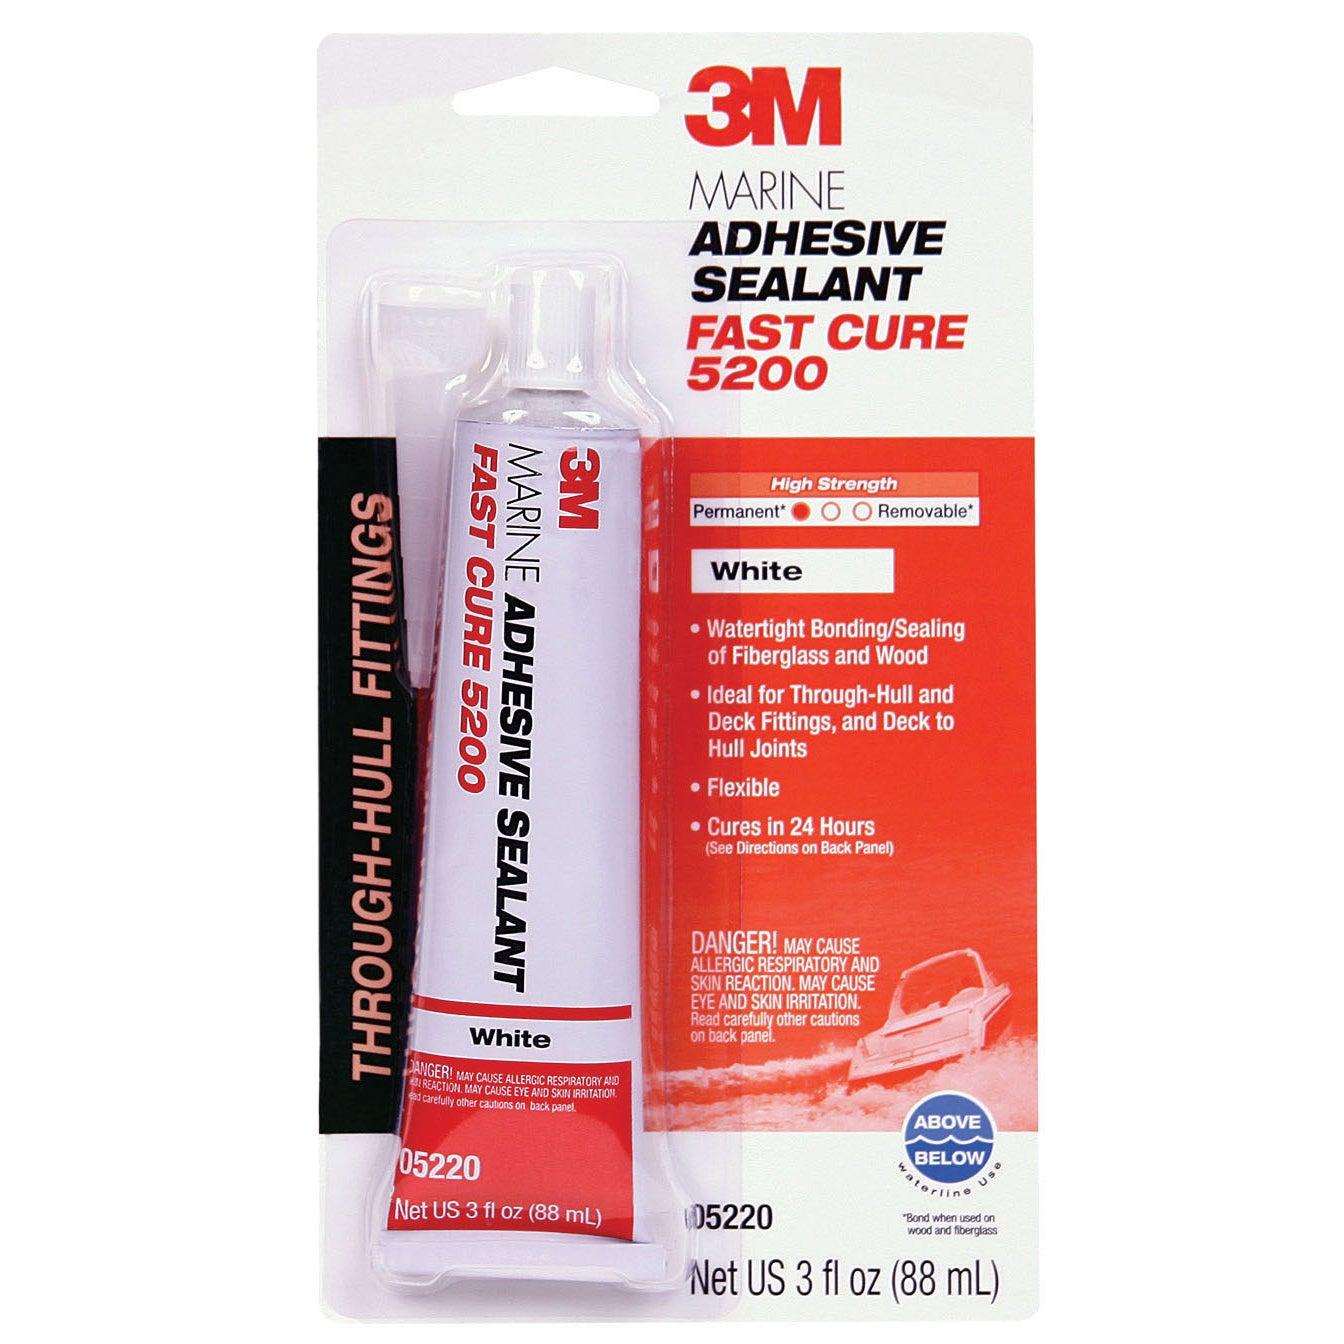 3M 05220 Marine Adhesive/Sealant Fast Cure 5200 (Fibergla...